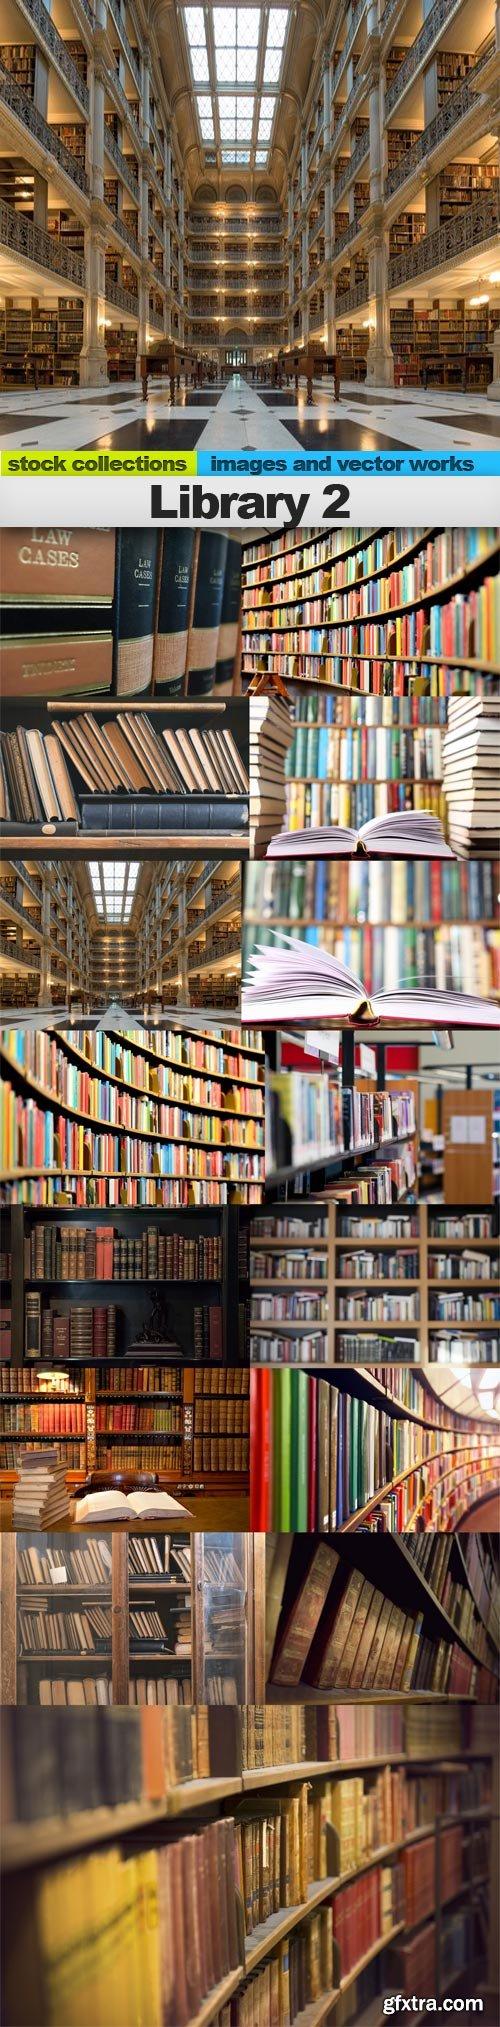 Library 2, 15 x UHQ JPEG